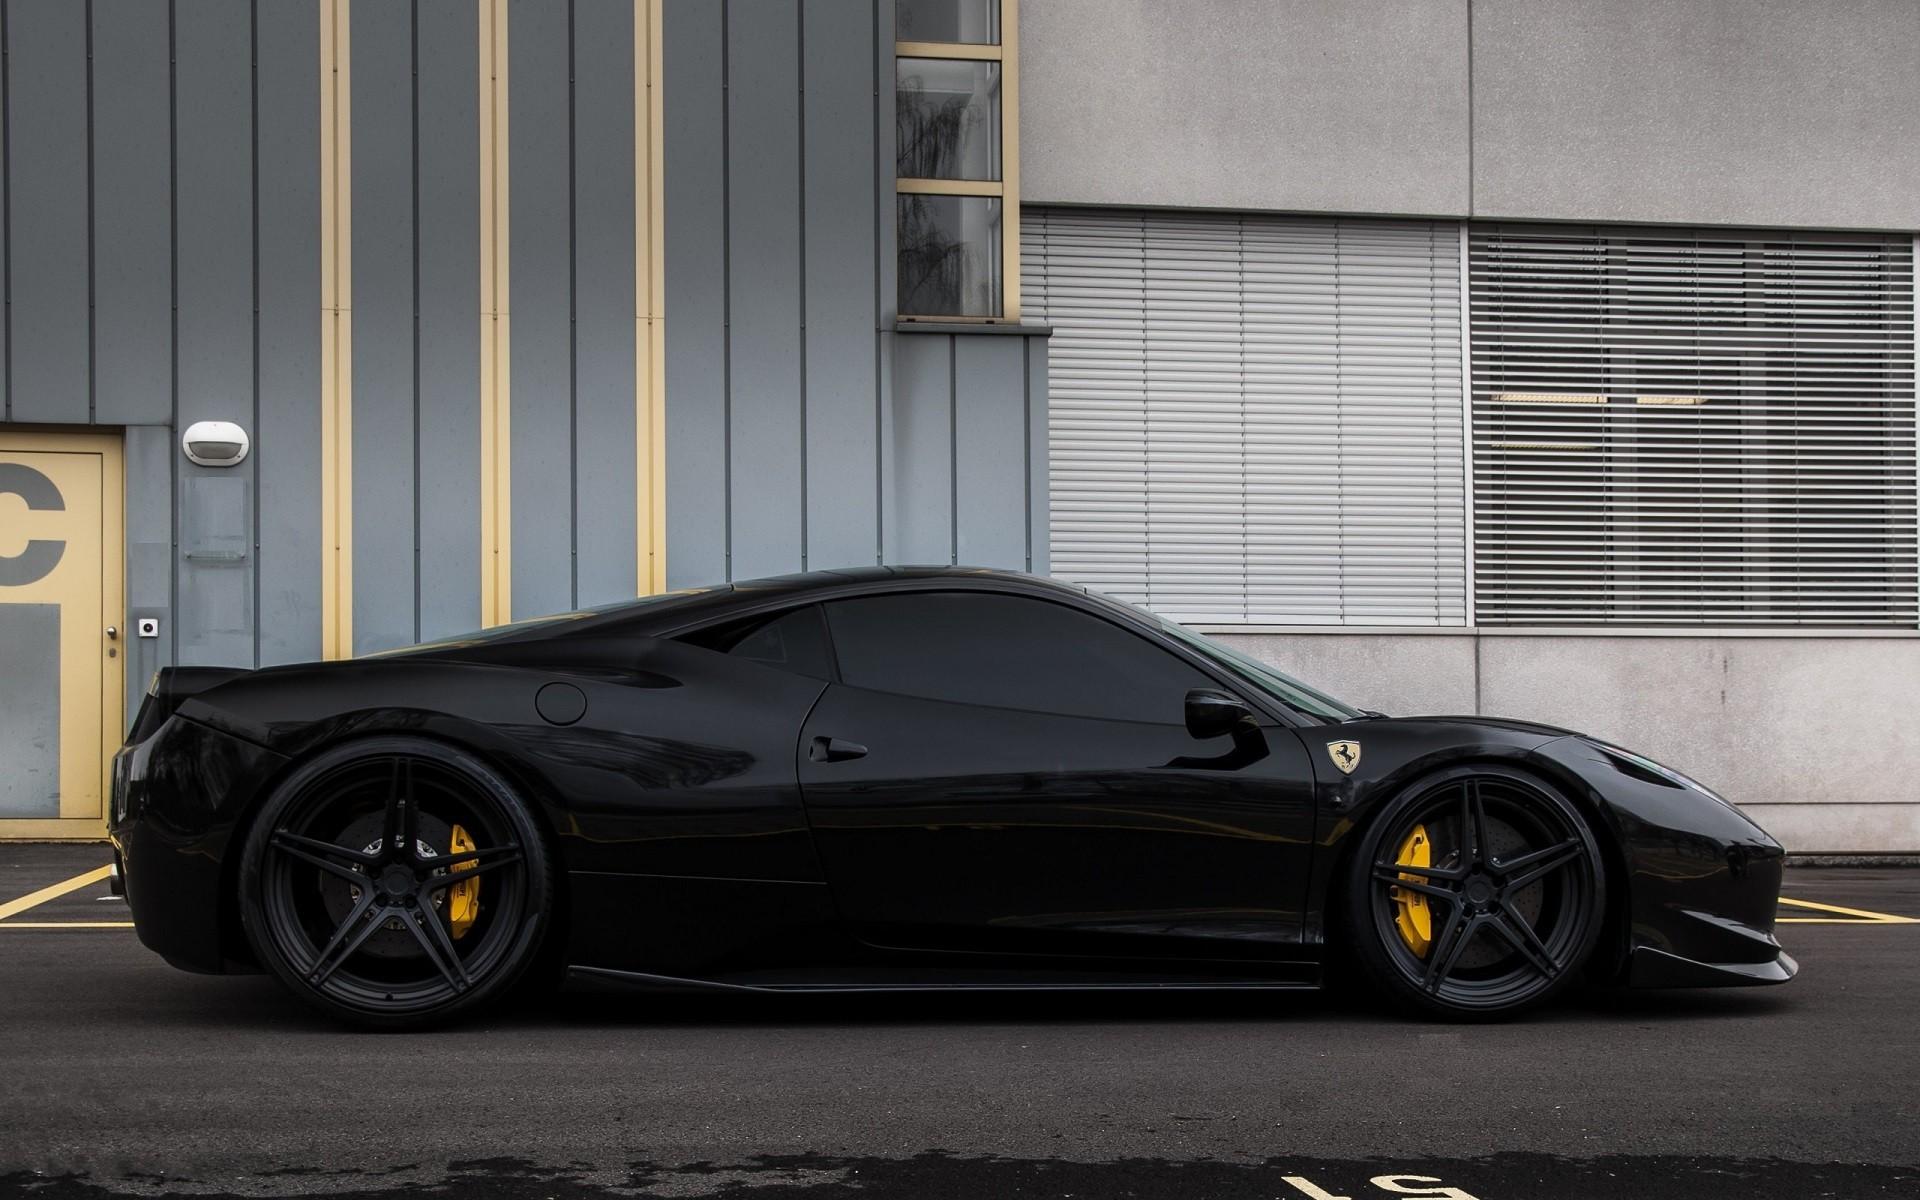 1920x1200 Px Ferrari 458